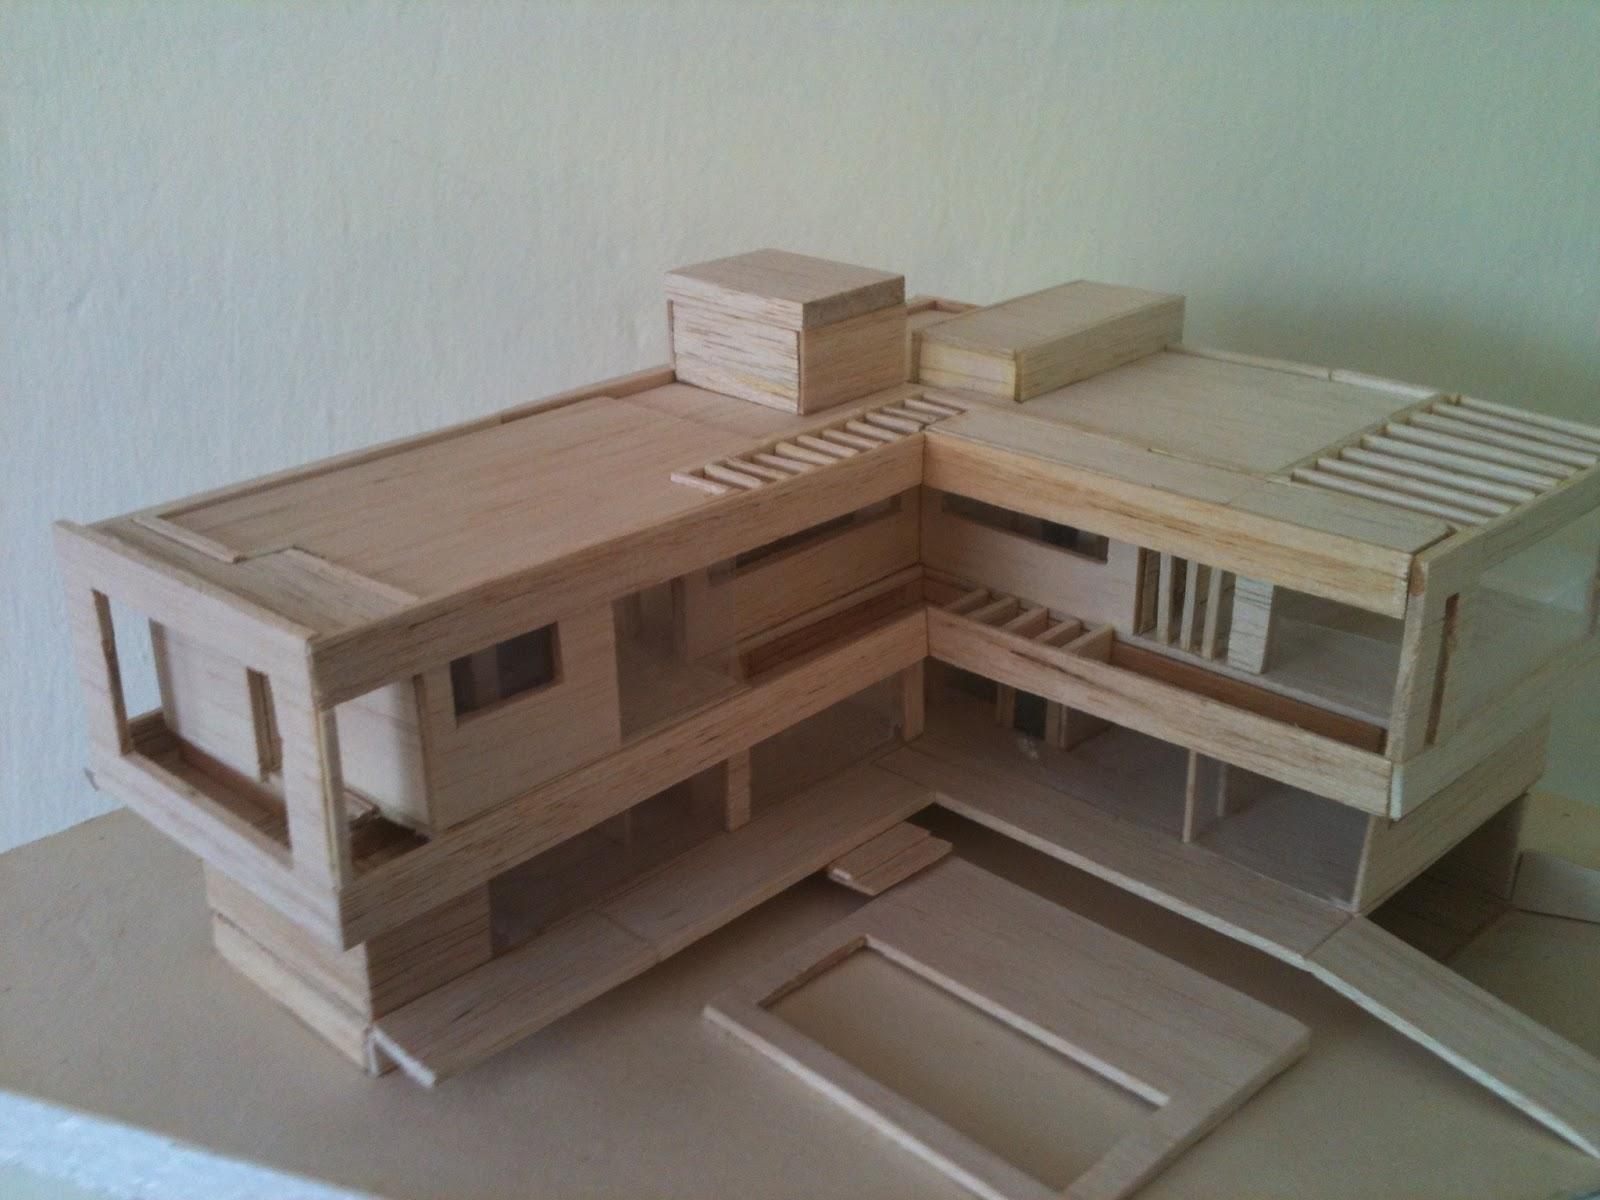 Maquete de prédio